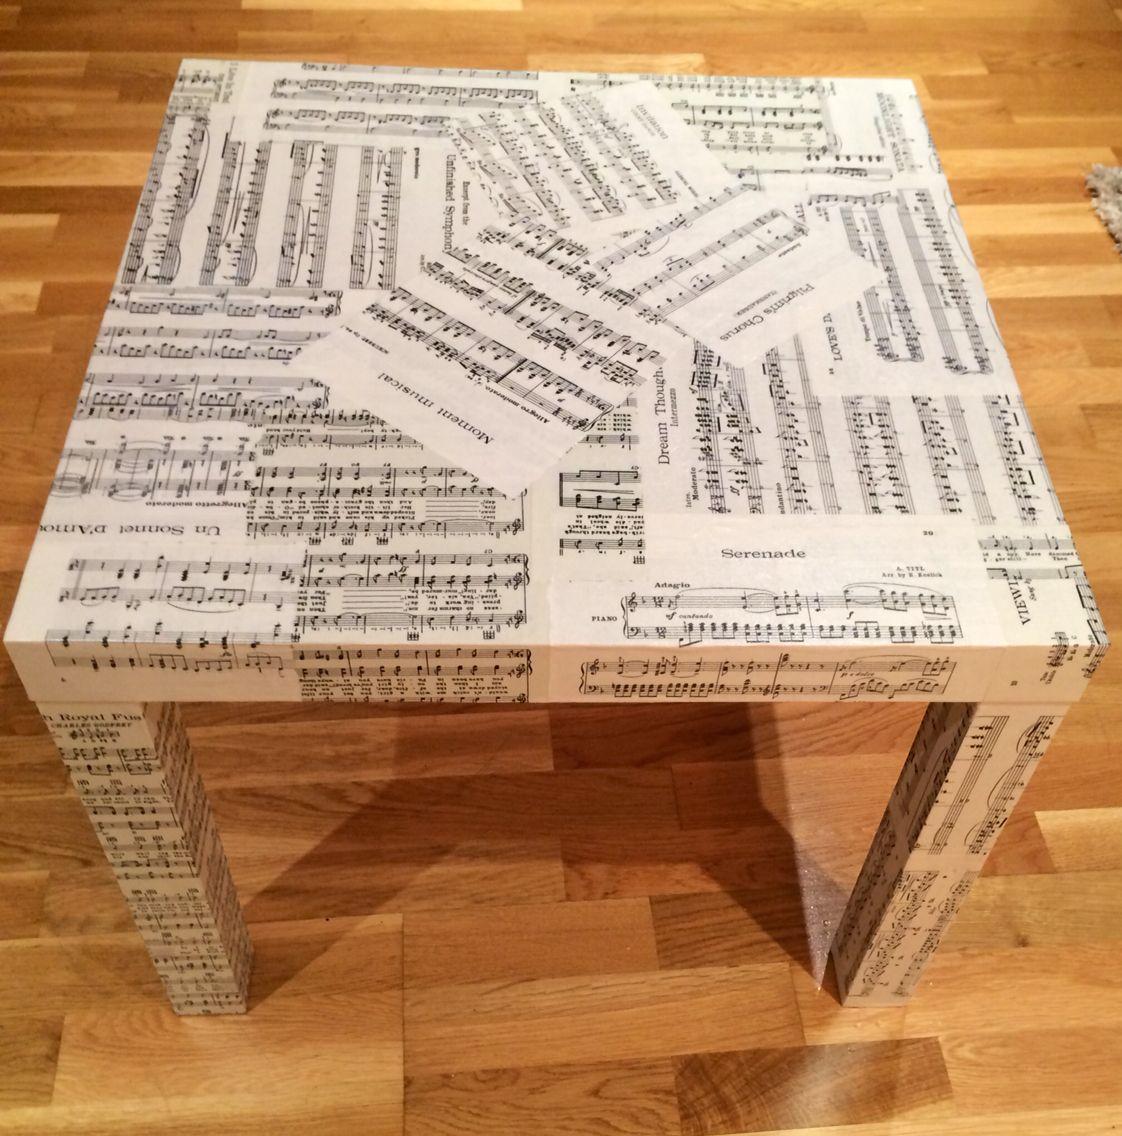 Ikea Lack Table Decoupage Ikea Lack Table Ikea Table Lack Table [ 1136 x 1122 Pixel ]